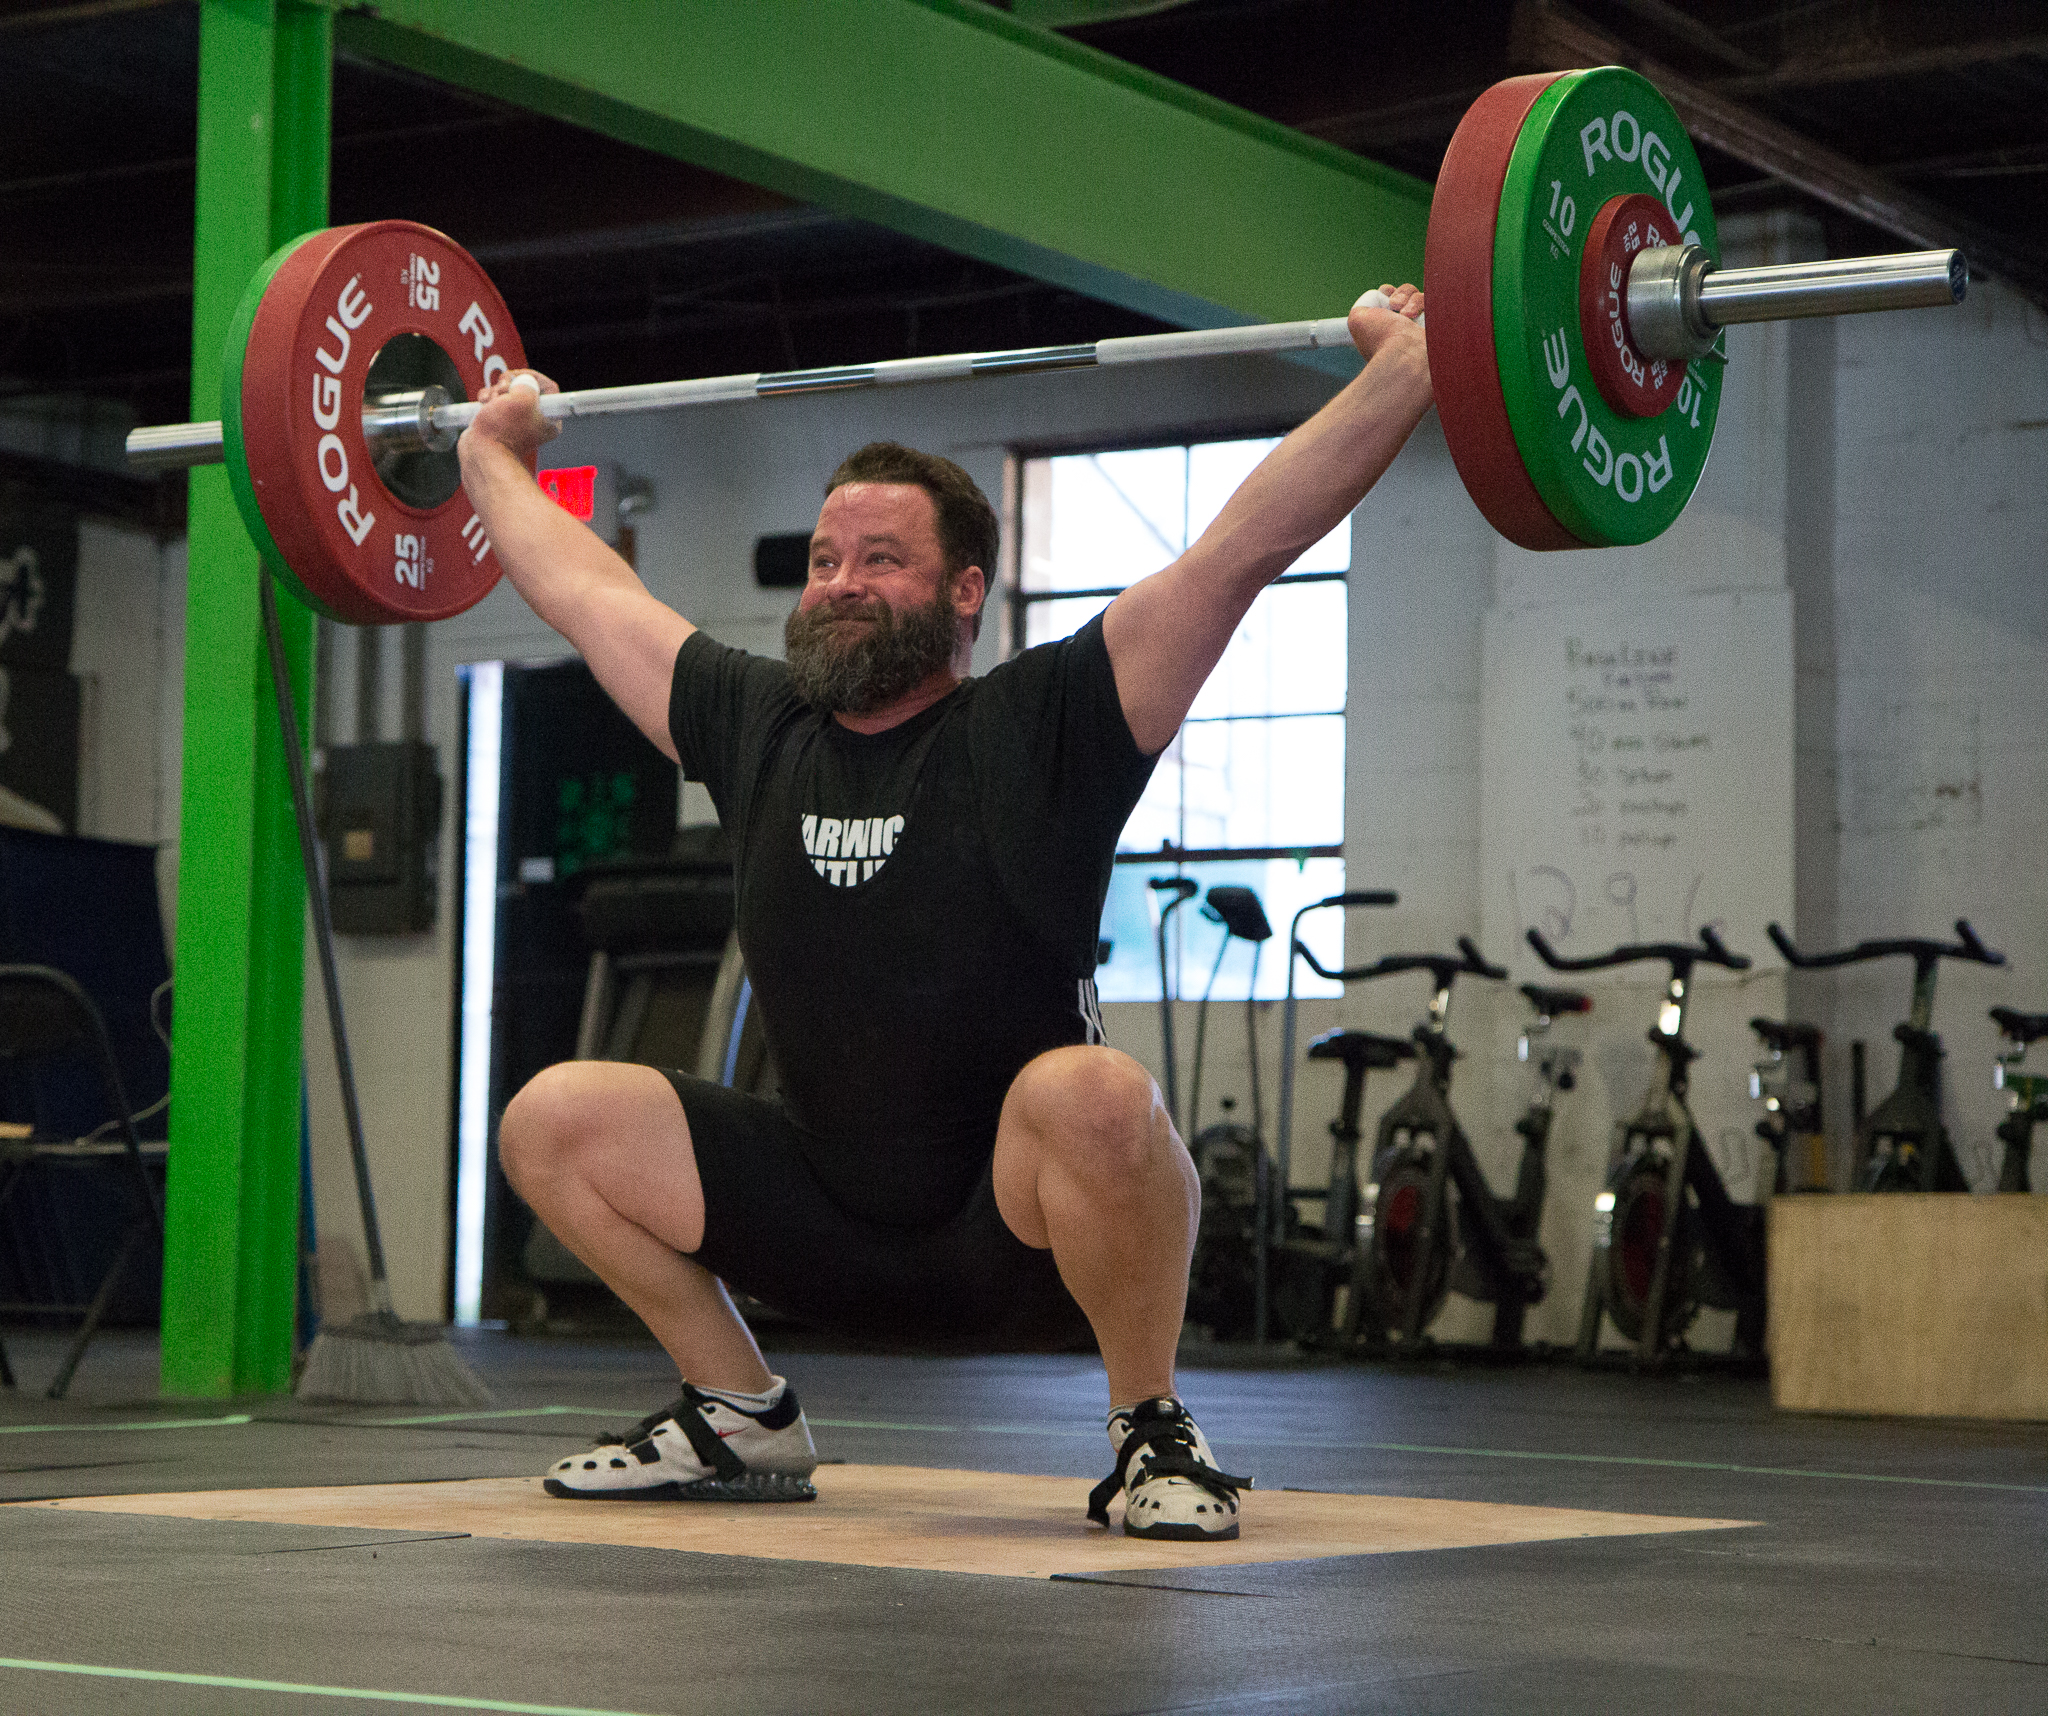 3-men-warwick-new-york-intrepid-strength-conditioning-winter-open-weightlifting-meet-weightlifting-photography (2 of 6).jpg